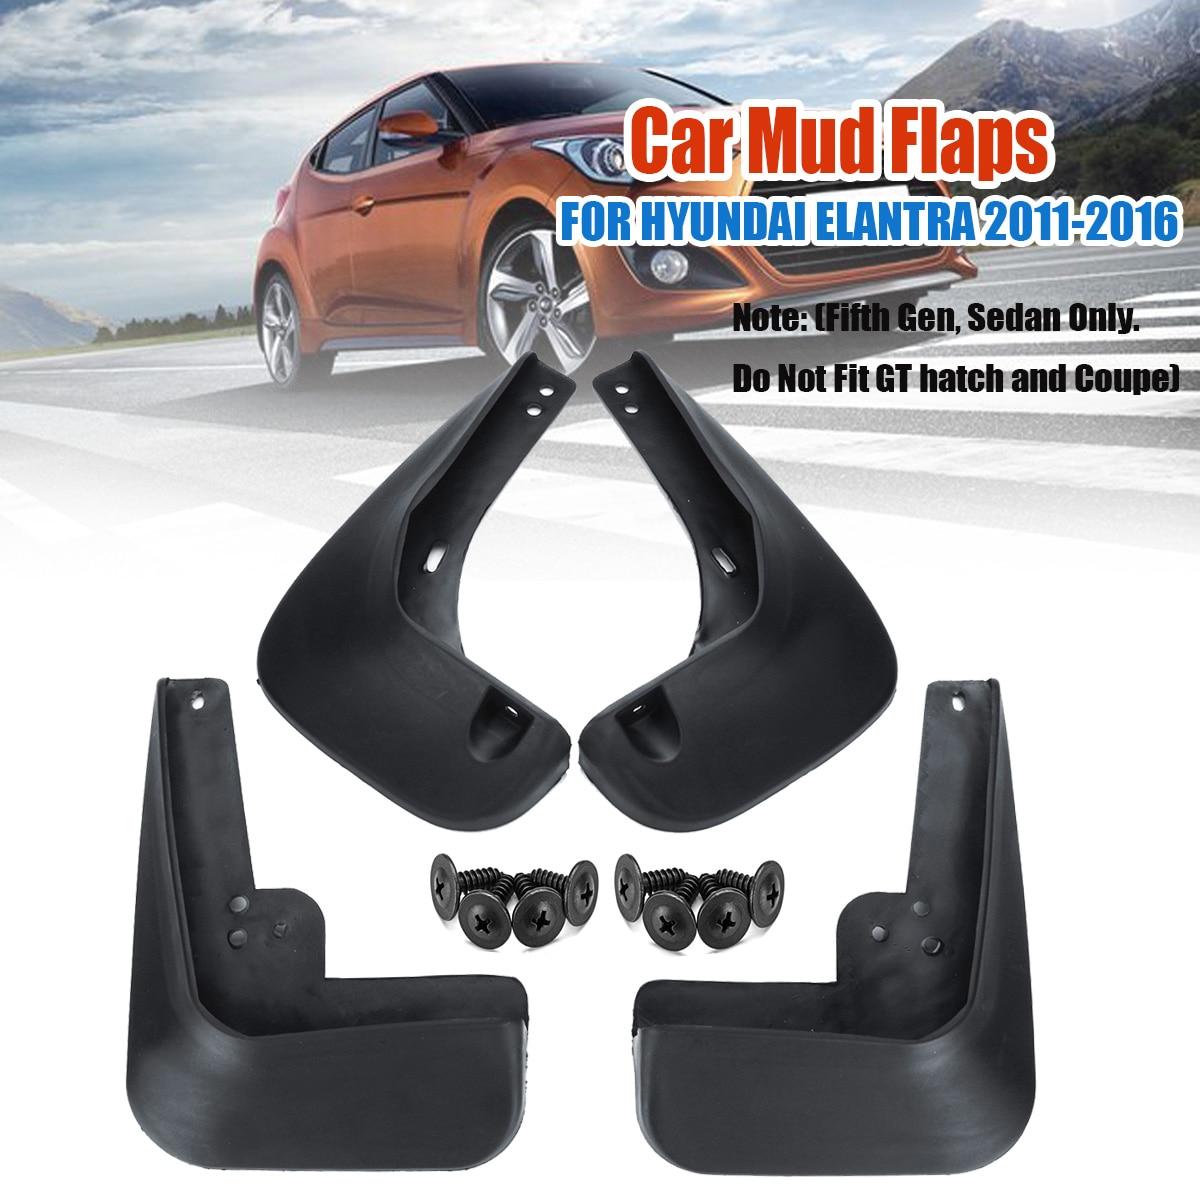 4pcs Car Accessories Mud Flaps Fender Flares for HYUNDAI ELANTRA 2011 2012 2013 2014 2015 2016 Mudflap Mudguards Splash Guard